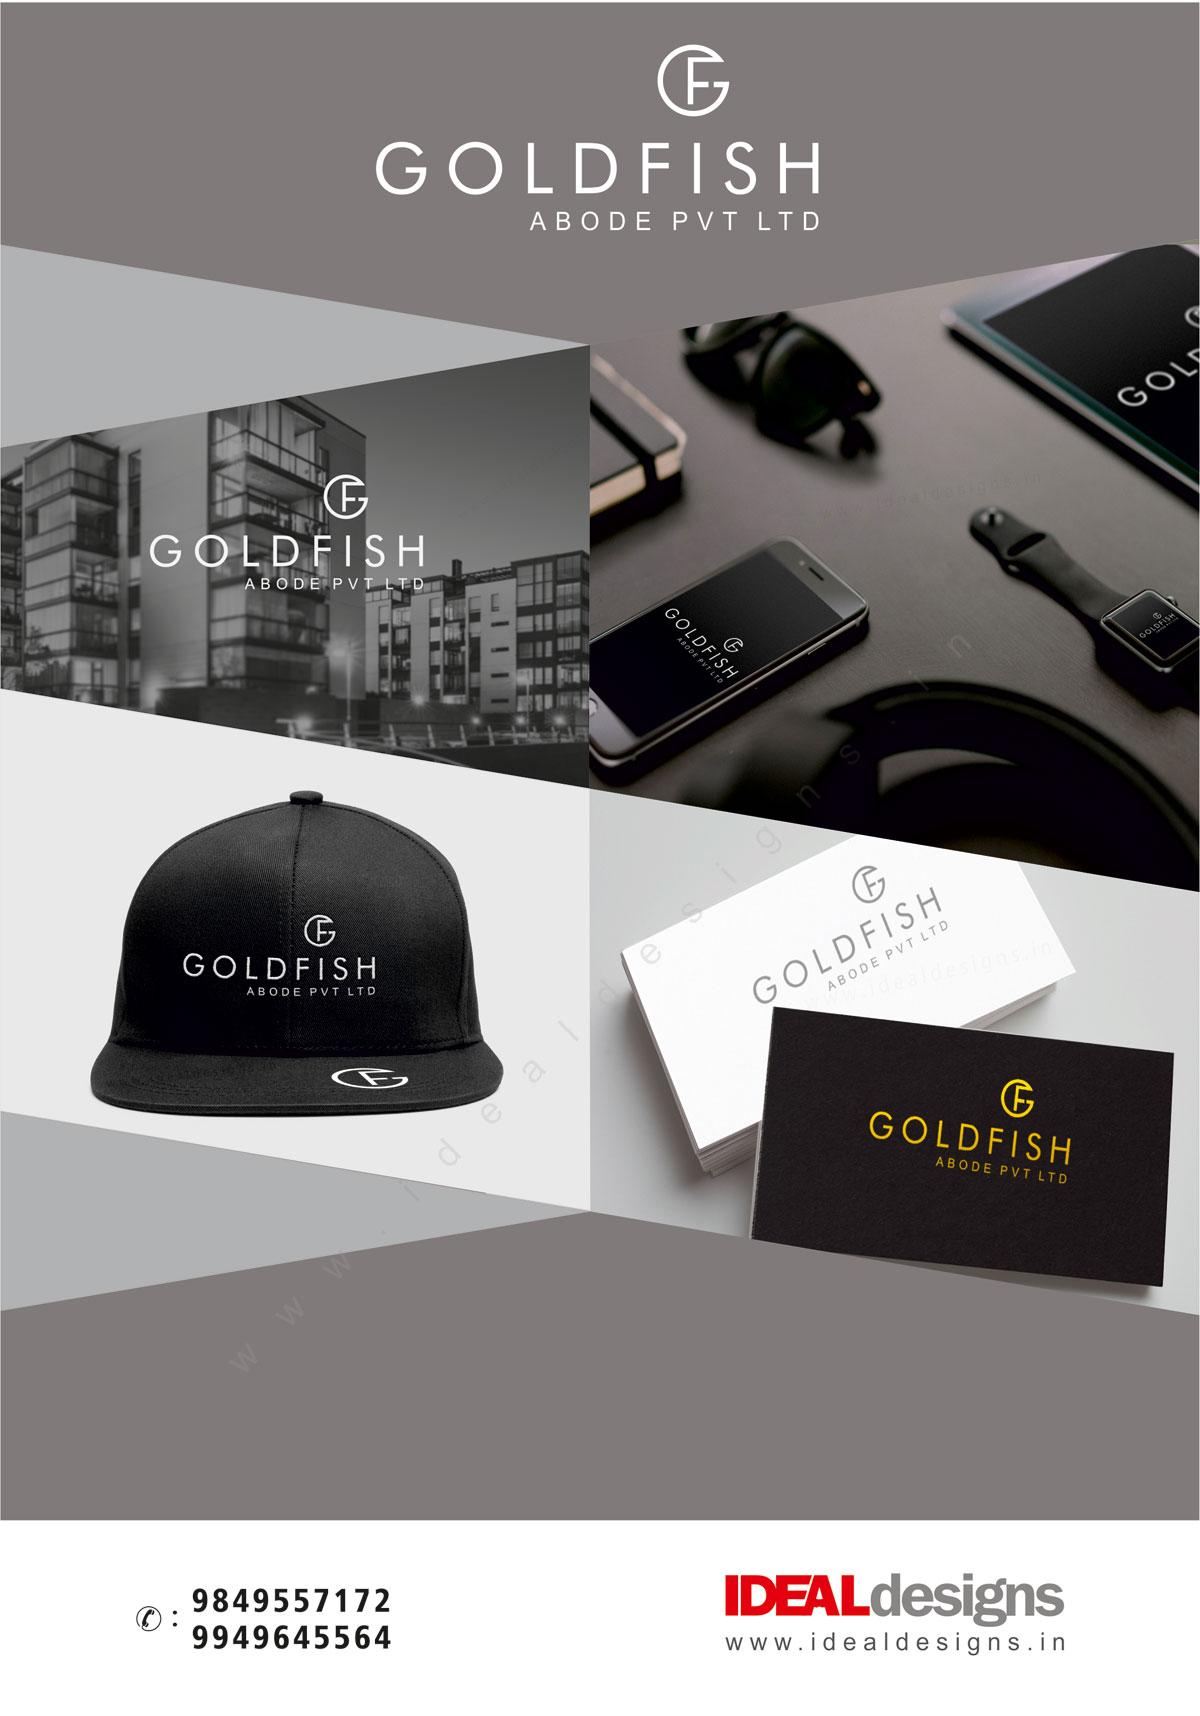 Professional-Designers-Logo-Design-CompanyWeb-Developers-India-Web-Designers-India-Best-Brochure-Design-Company-Offers-Brochure-Design-Services.jpg